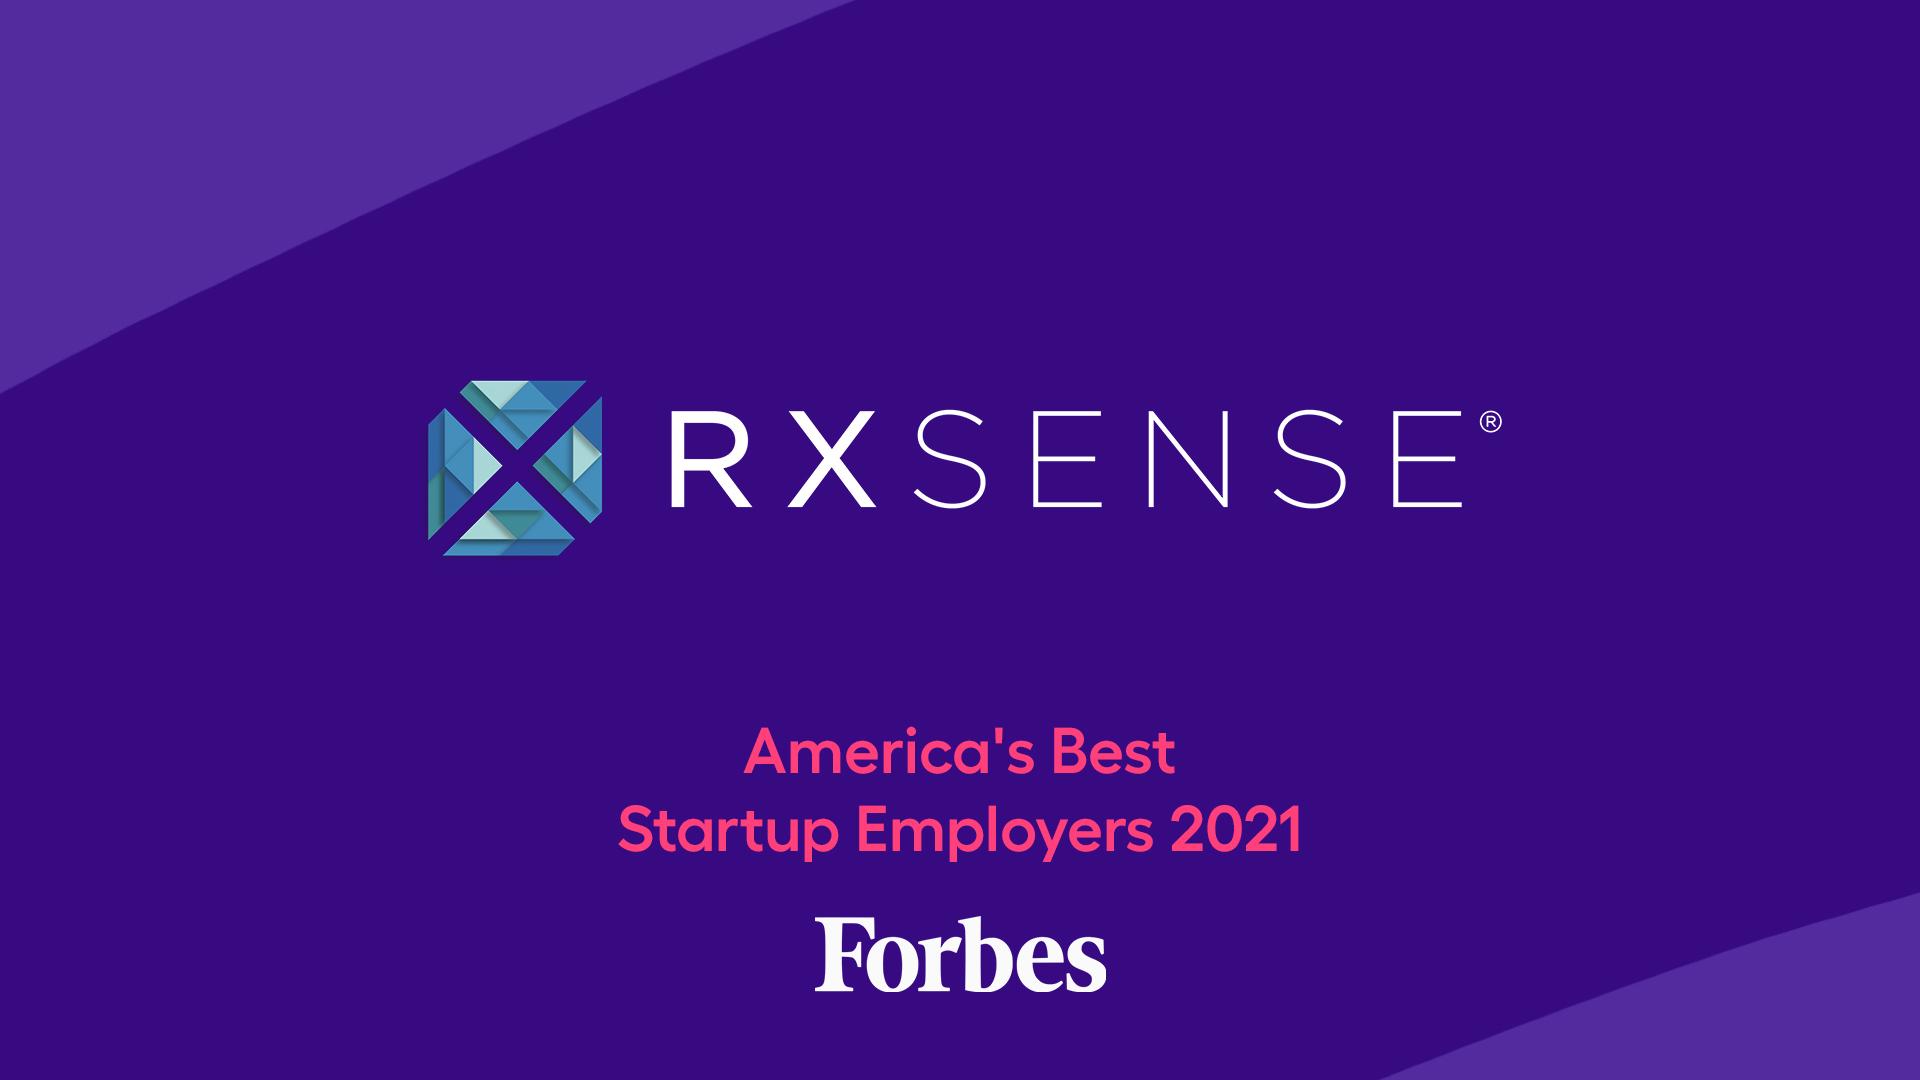 RxSense wins America's Best Startup Employers 2021 award